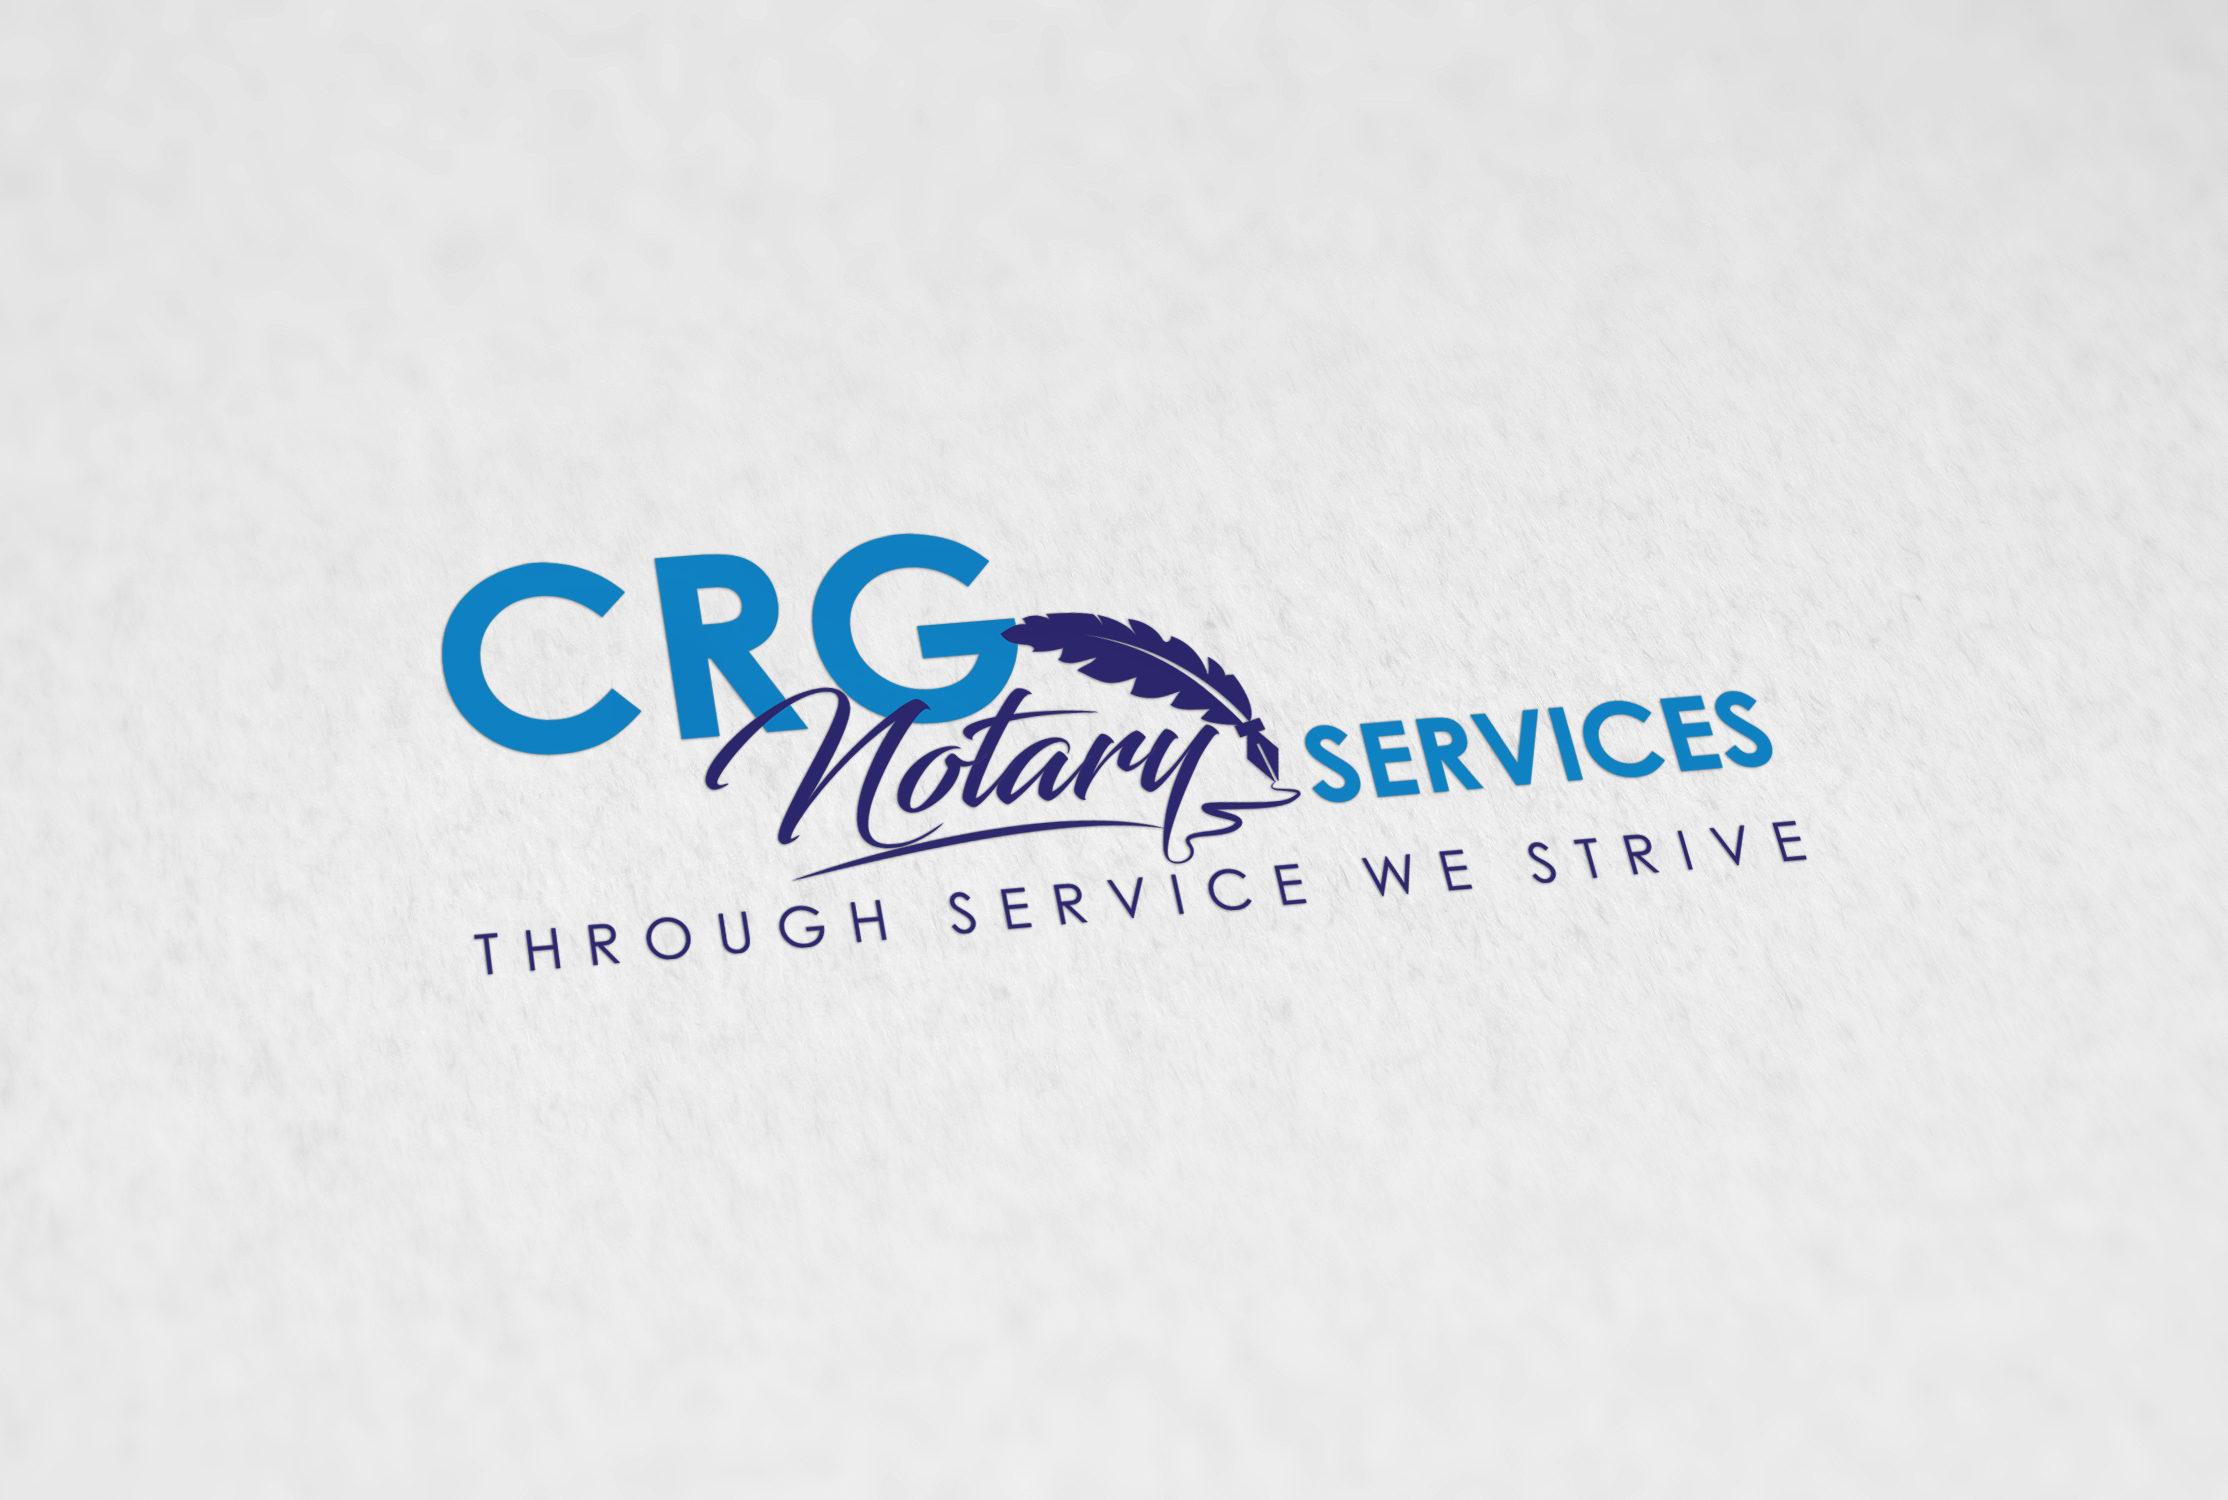 Through Service We Strive